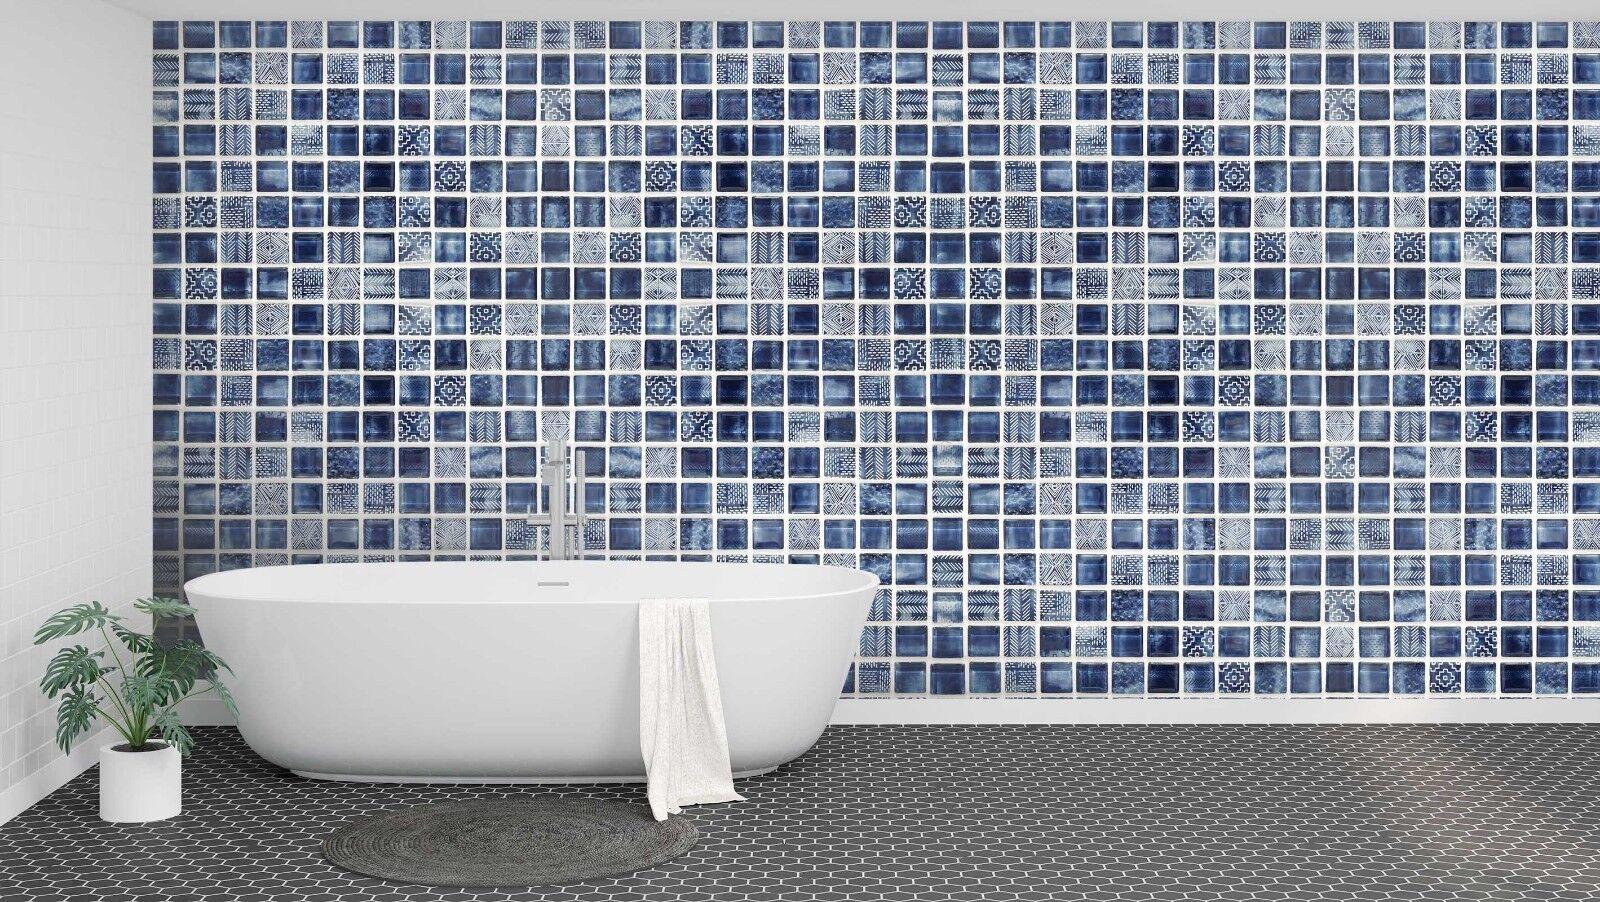 3D Weiß Line Slate 81 Texture Tiles Marble Wall Paper Decal Wallpaper Mural AJ